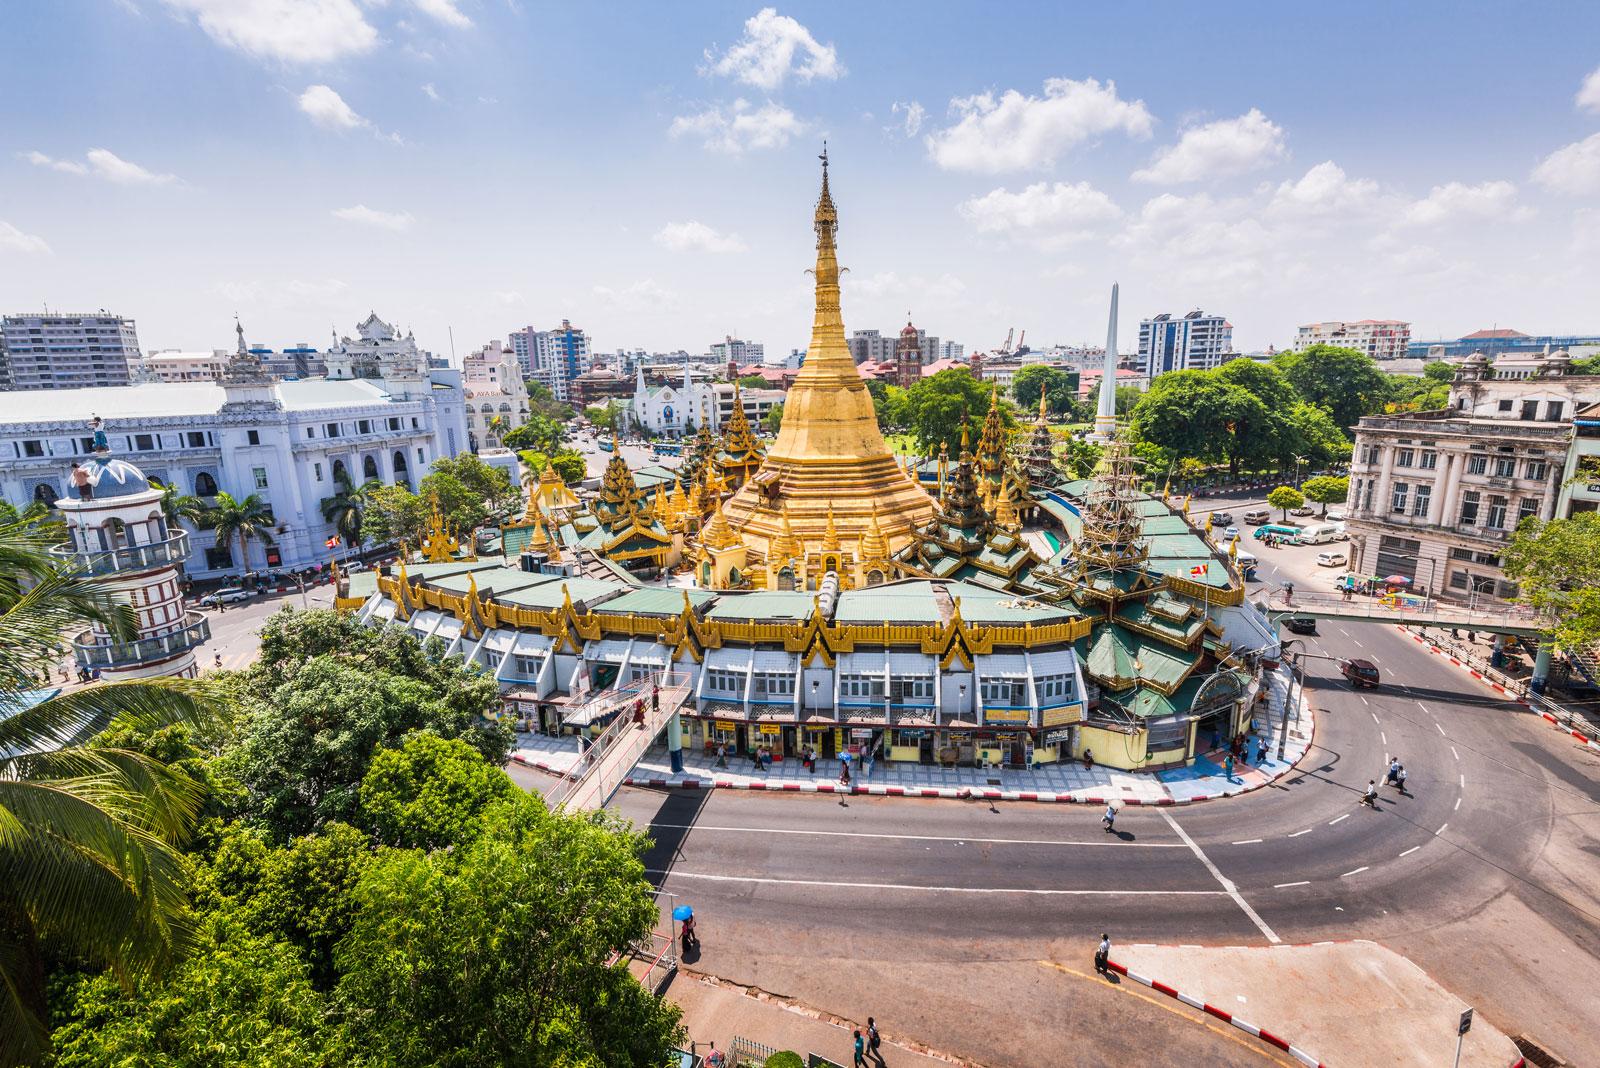 Sule pagoda, in the center of Yangon, Myanmar